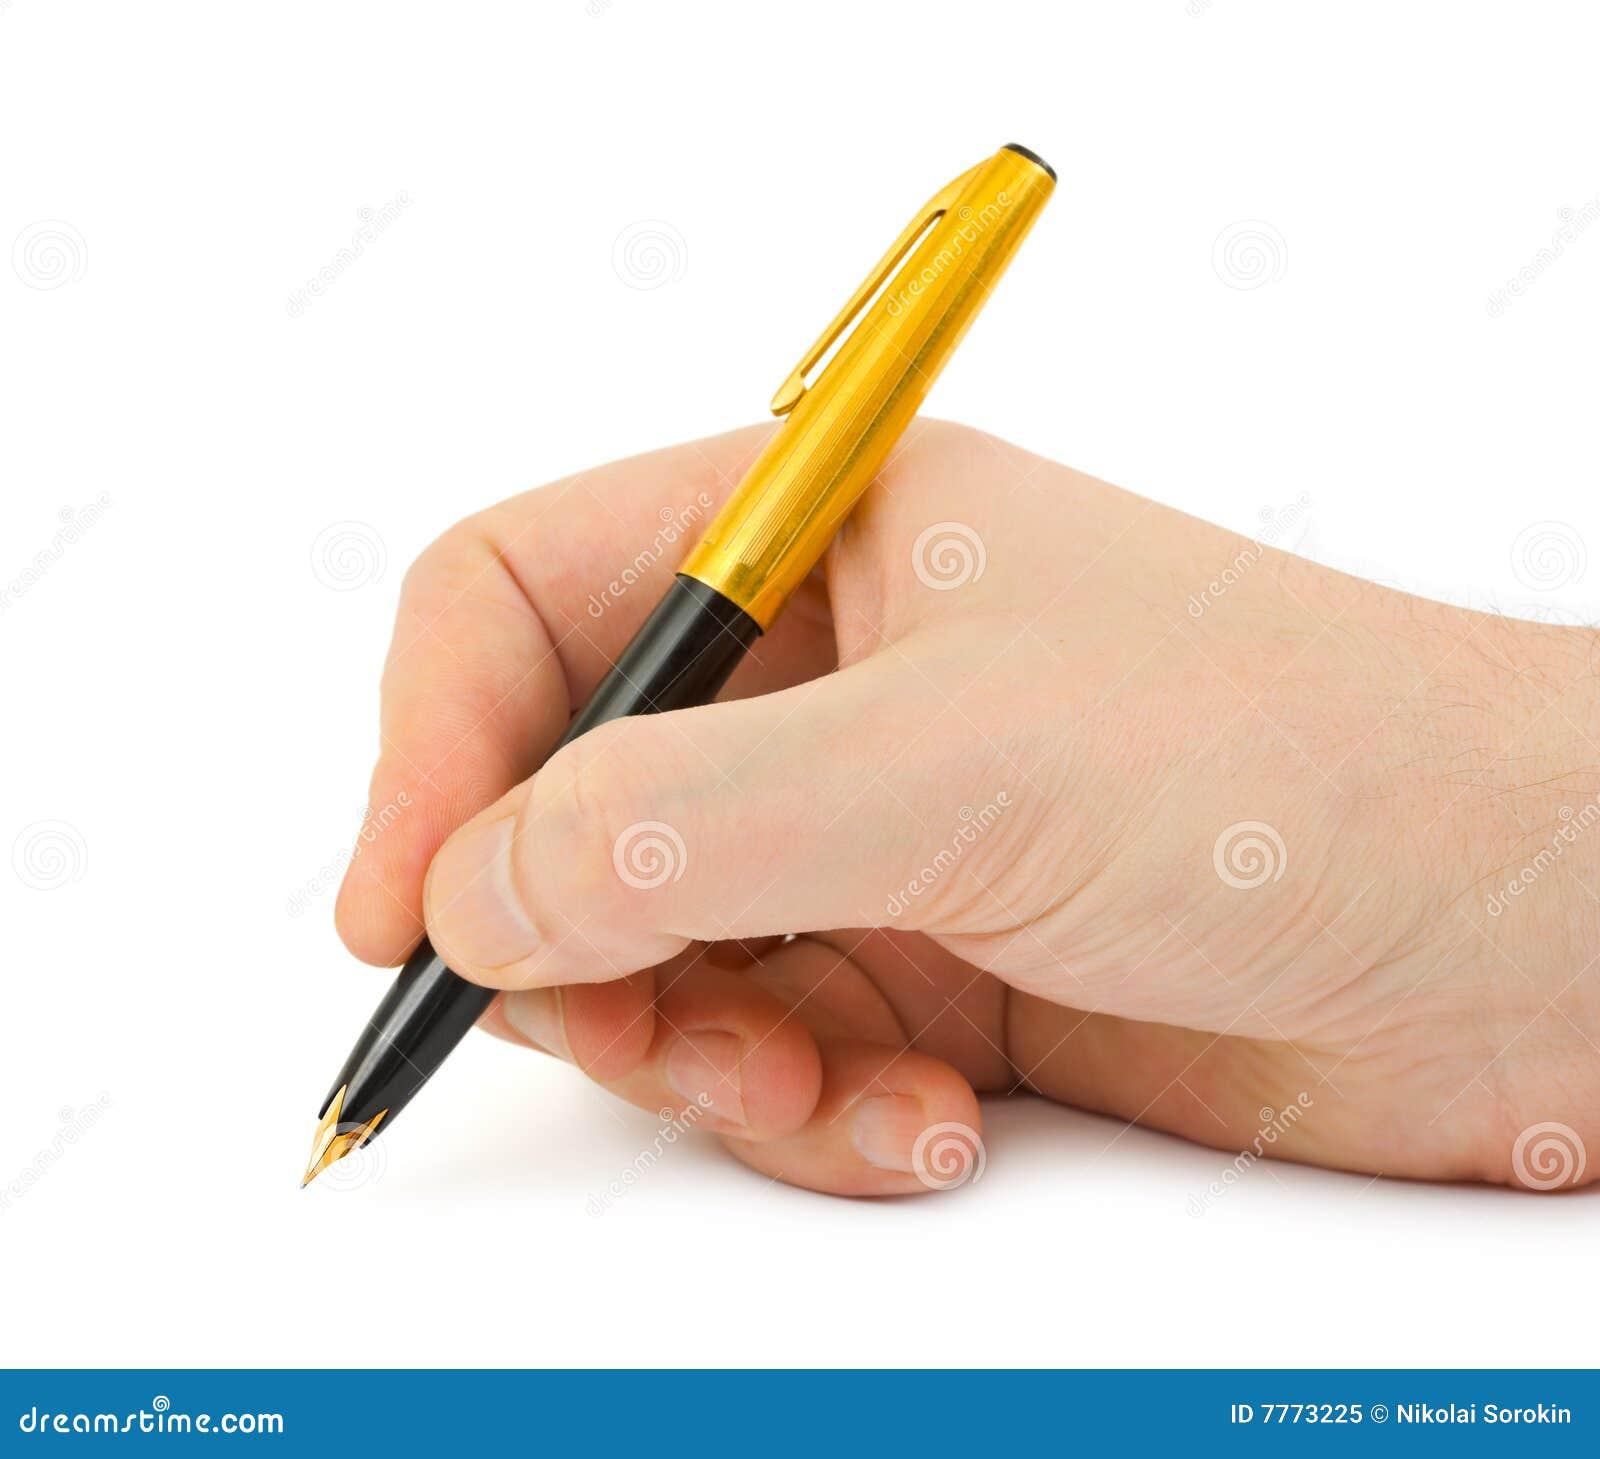 Oxford left handed cartridge pen